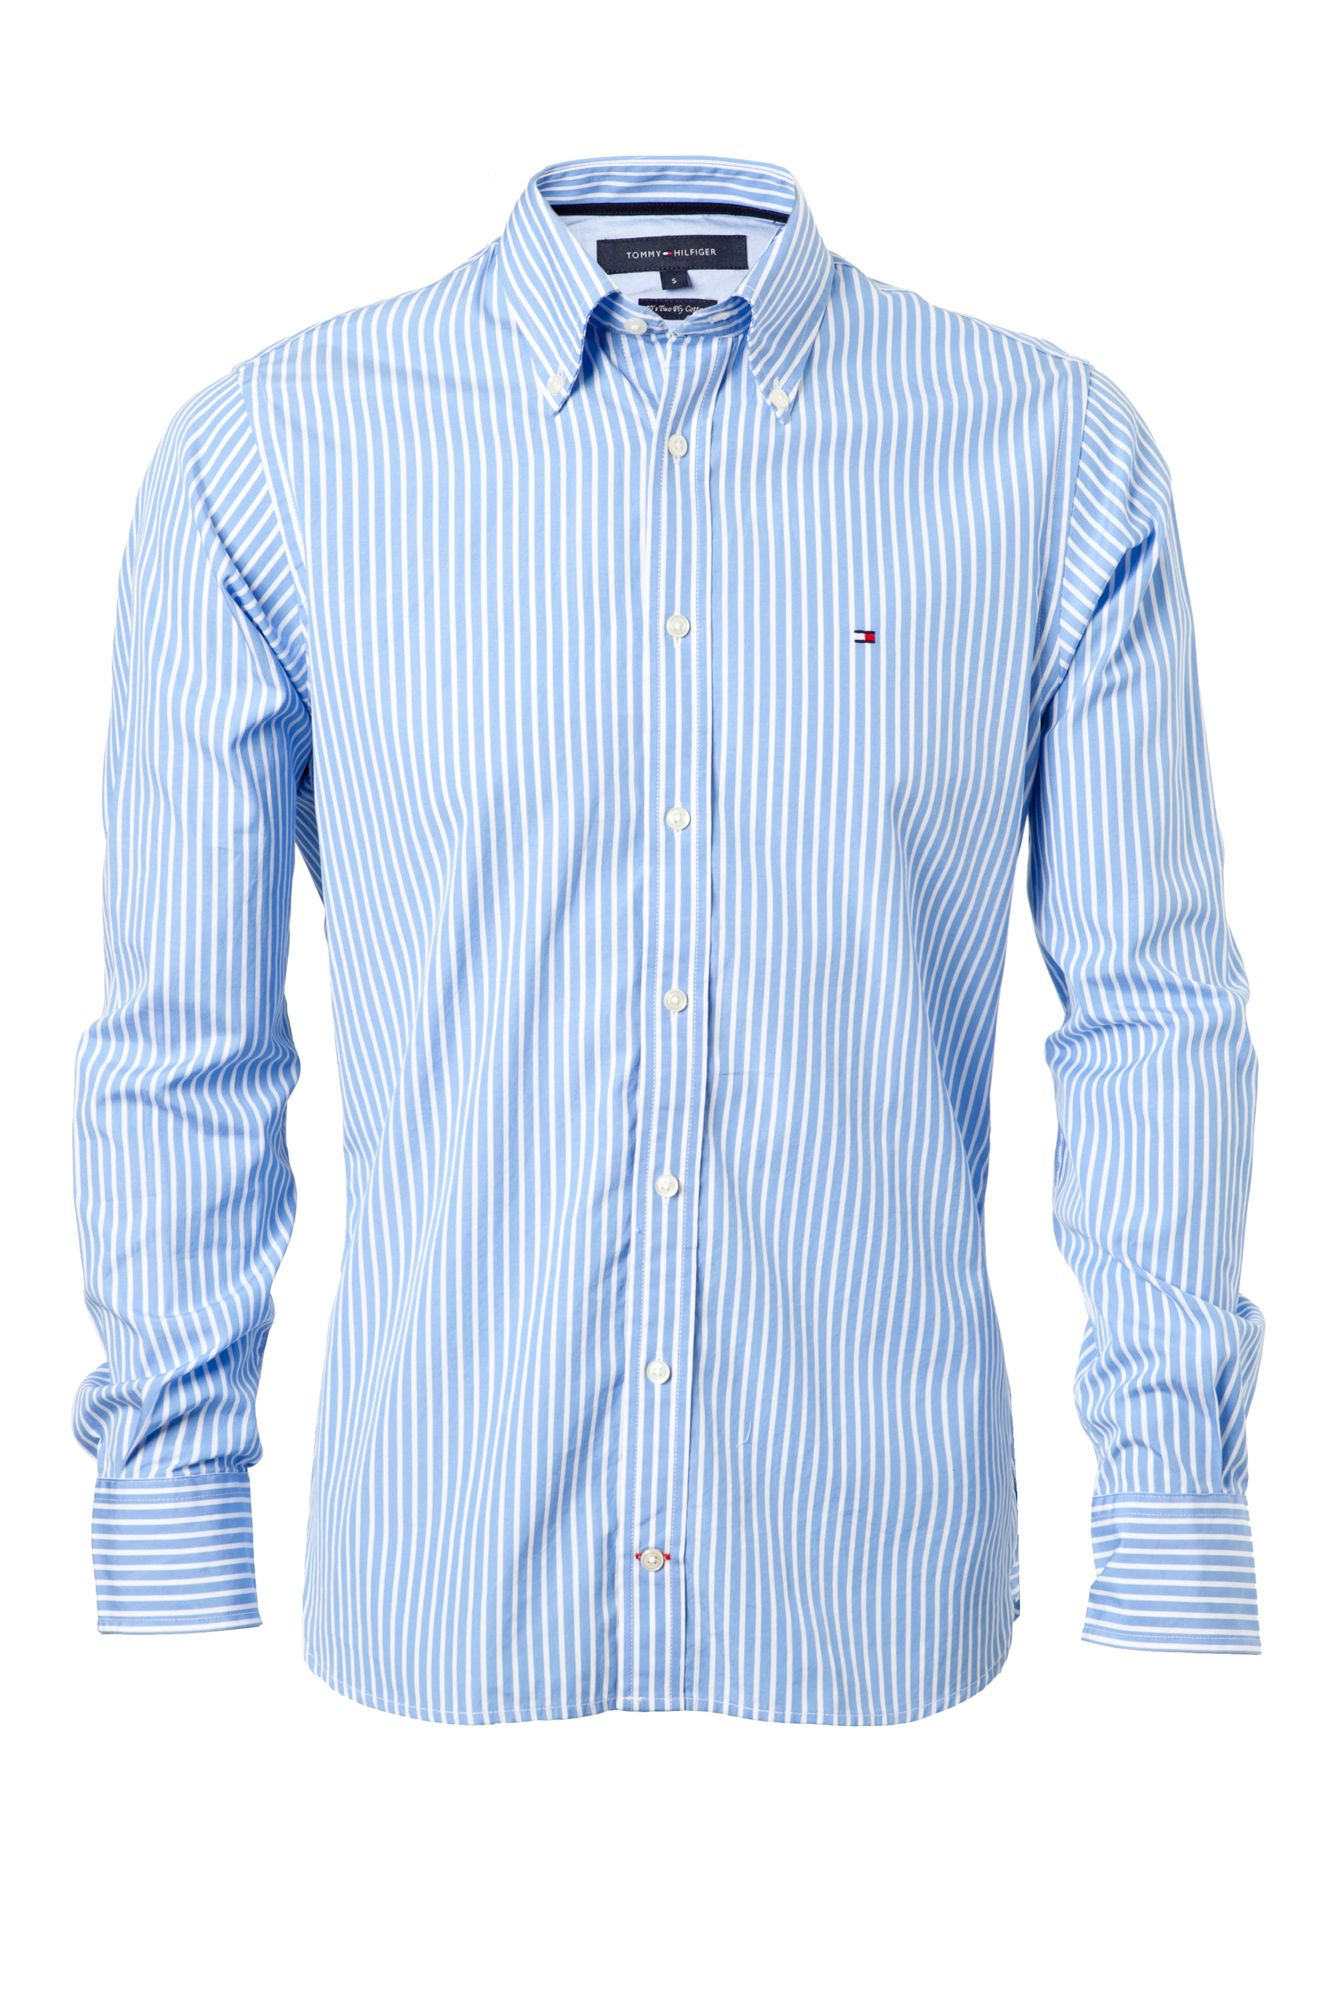 Tommy hilfiger new york stripe shirt in blue for men lyst for Tommy hilfiger fitzgerald striped shirt